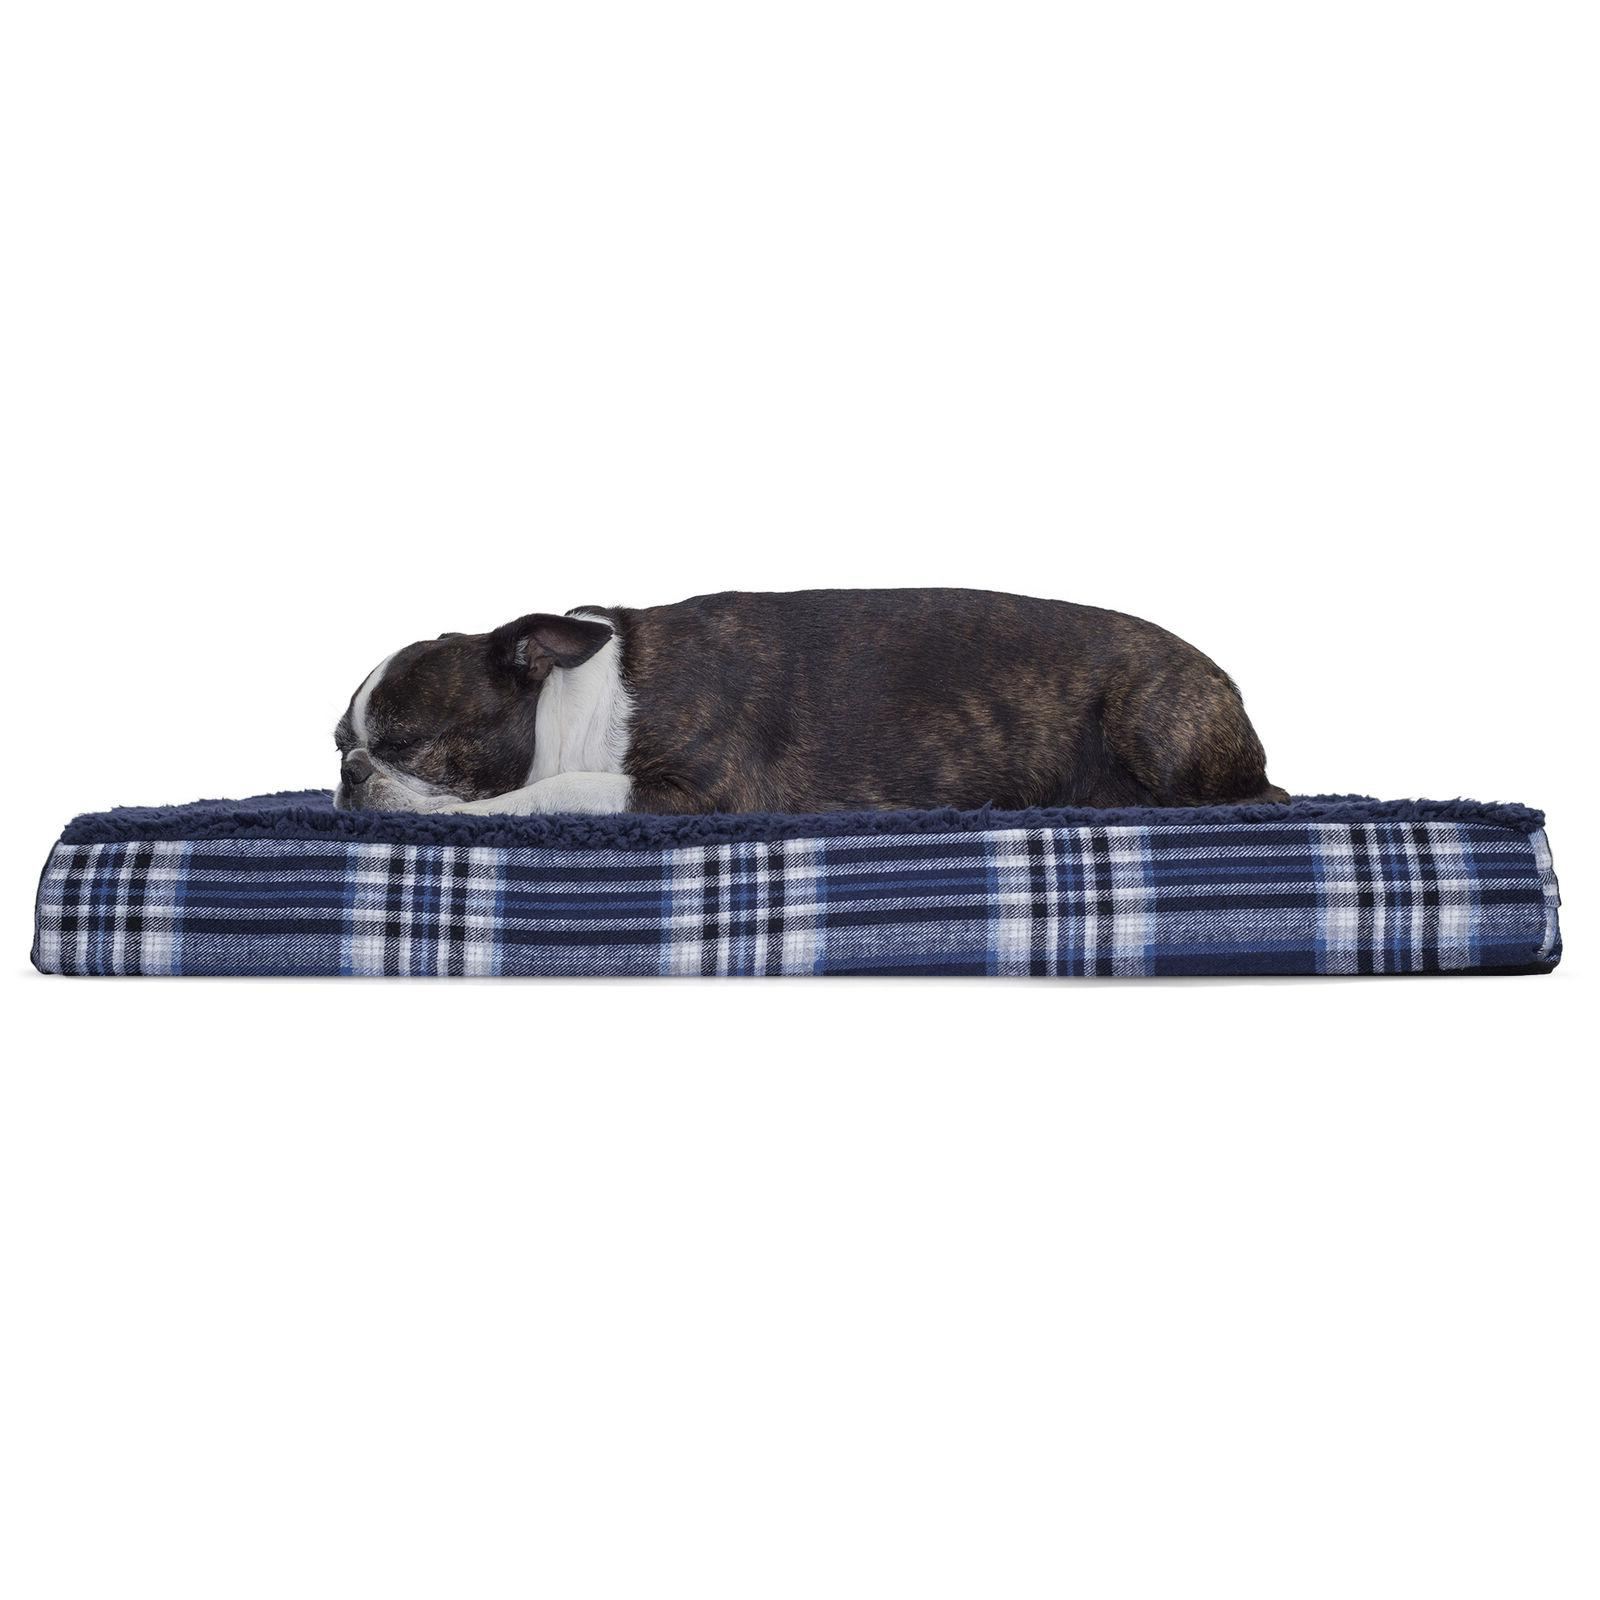 FurHaven Pet Bed Egg-Crate Orthopedic Bed